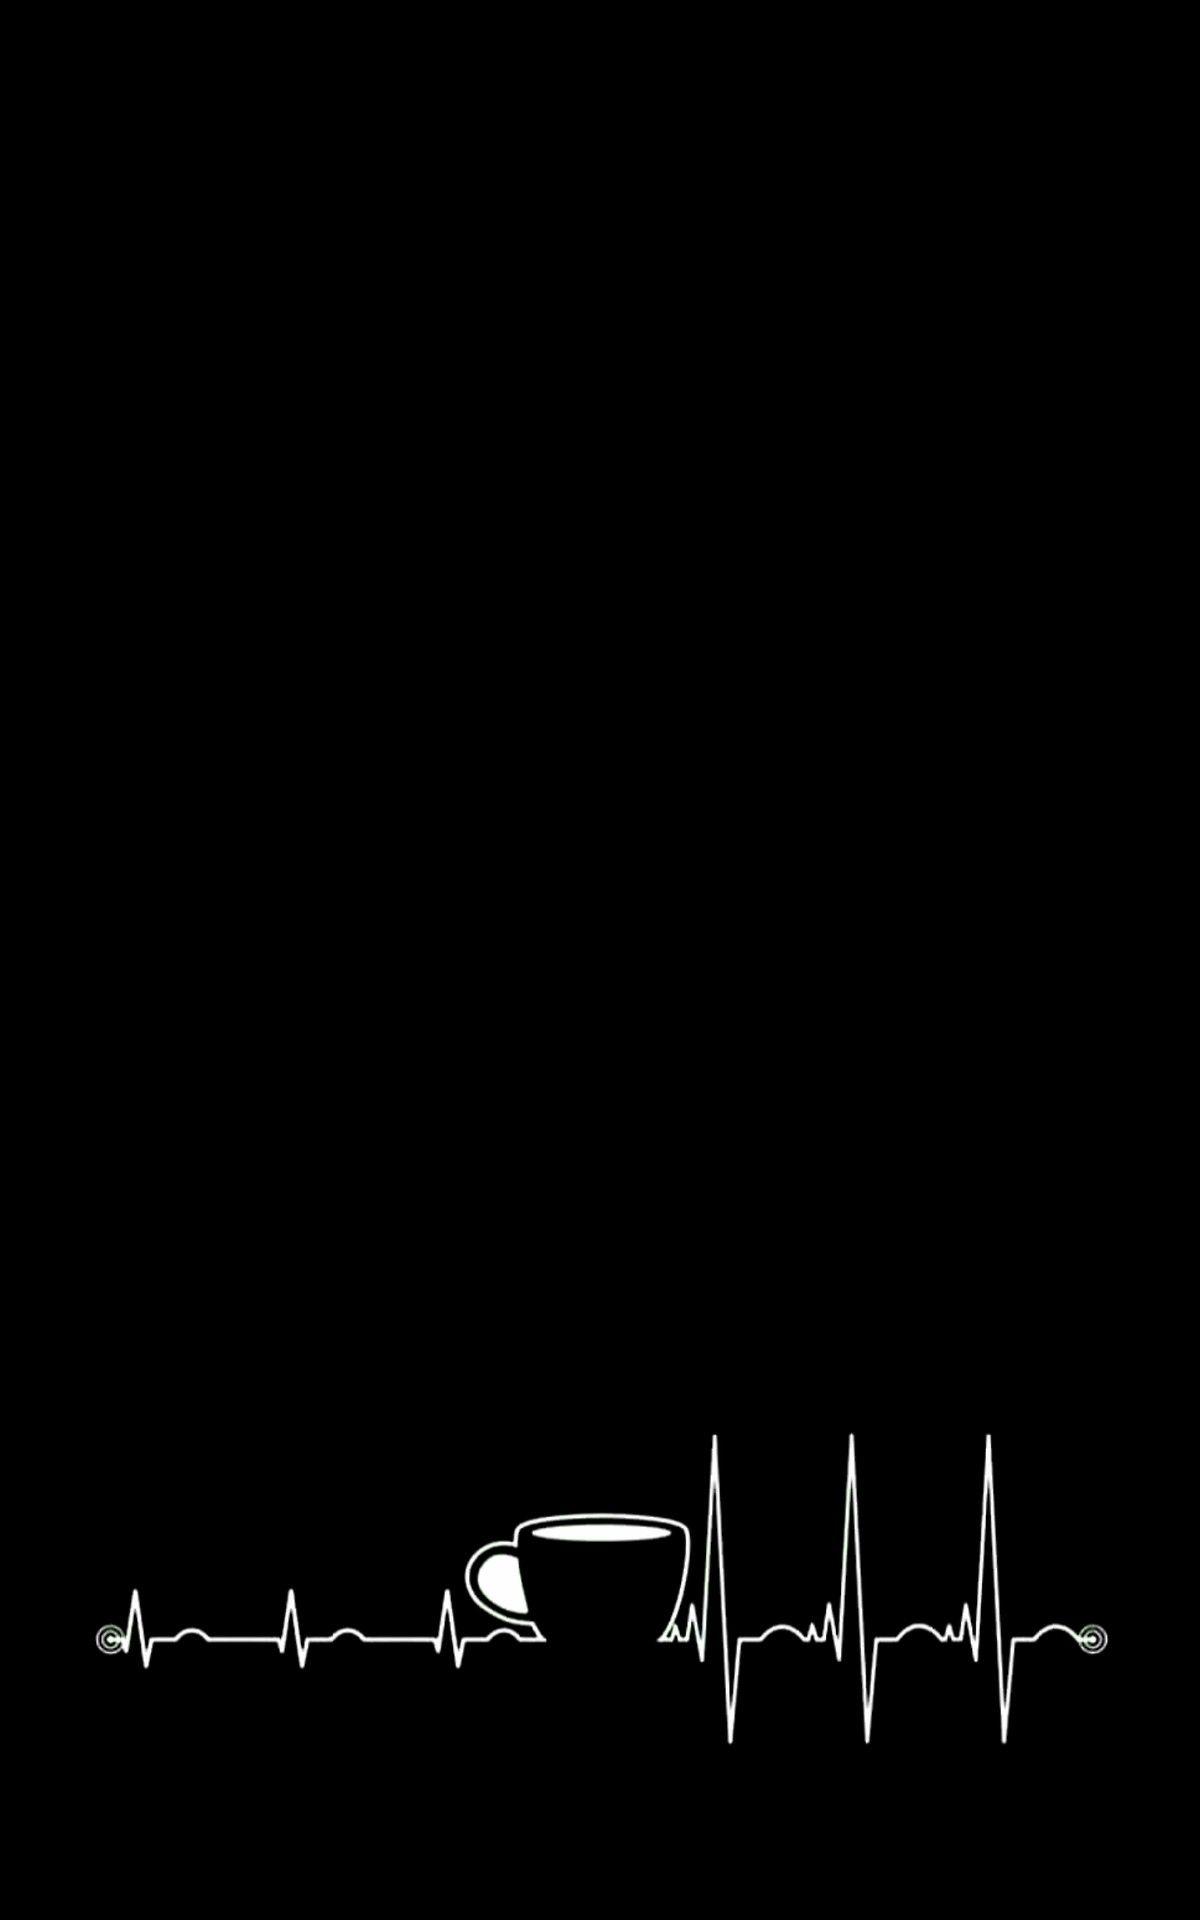 Pin by Hadi Demir on Samsung S8 wallpaper Pinterest